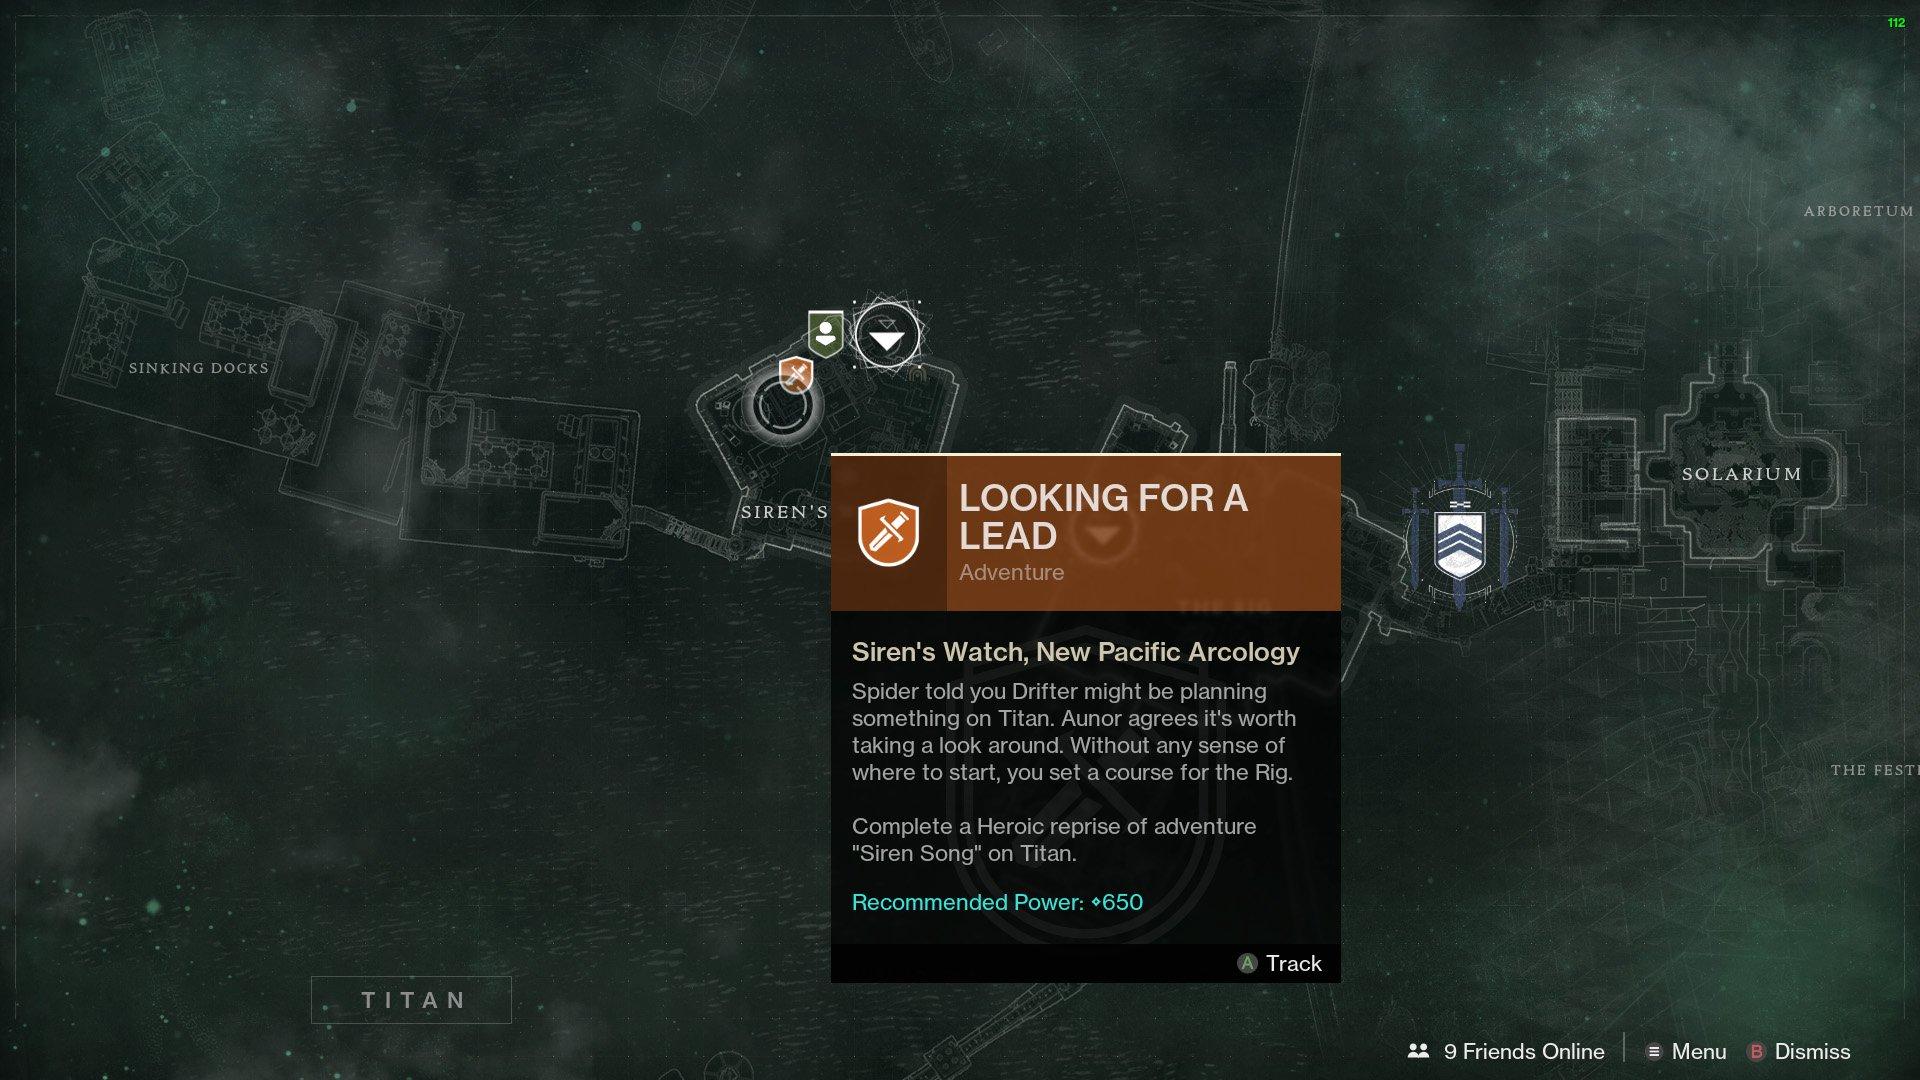 Destiny 2 Allegiance Vanguard Looking for a Lead Siren Song